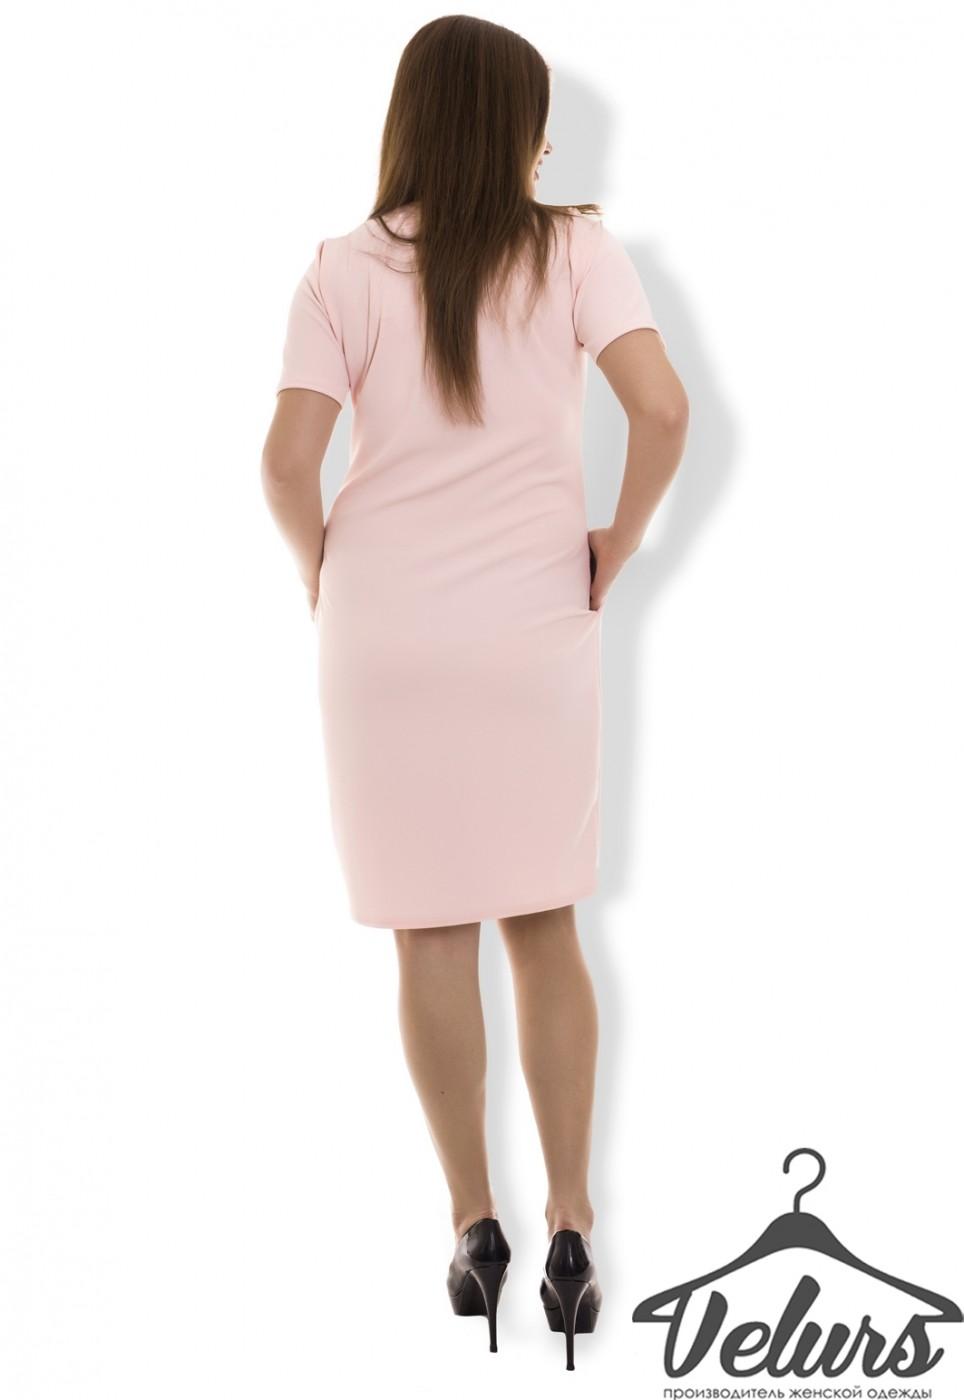 Velurs: Платье 212066 - фото 3